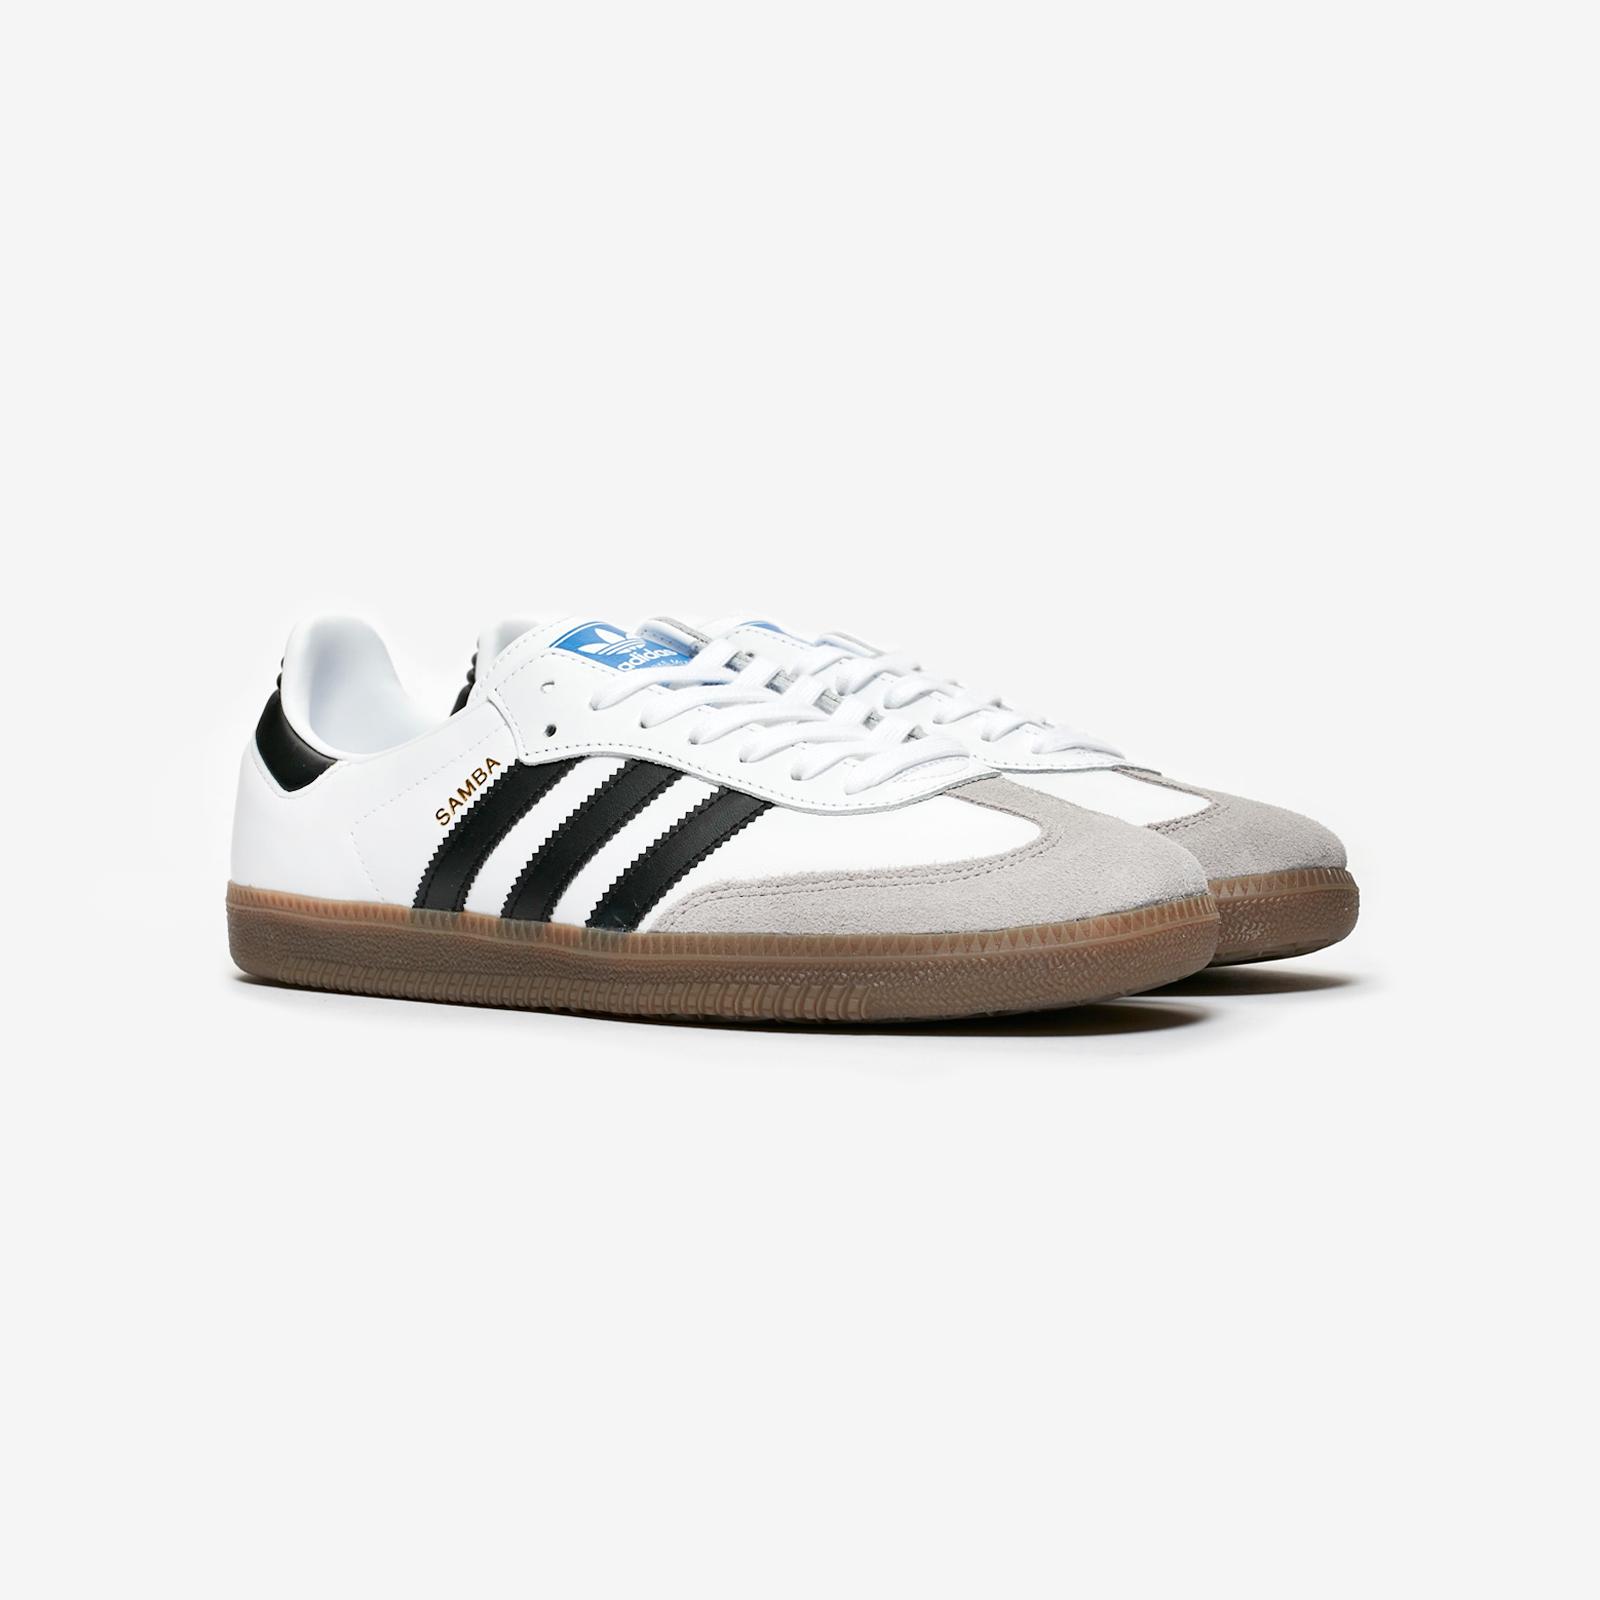 Streetwear Samba B75806 Og Adidas SneakersnstuffSneakersamp; CxeoQrdBW